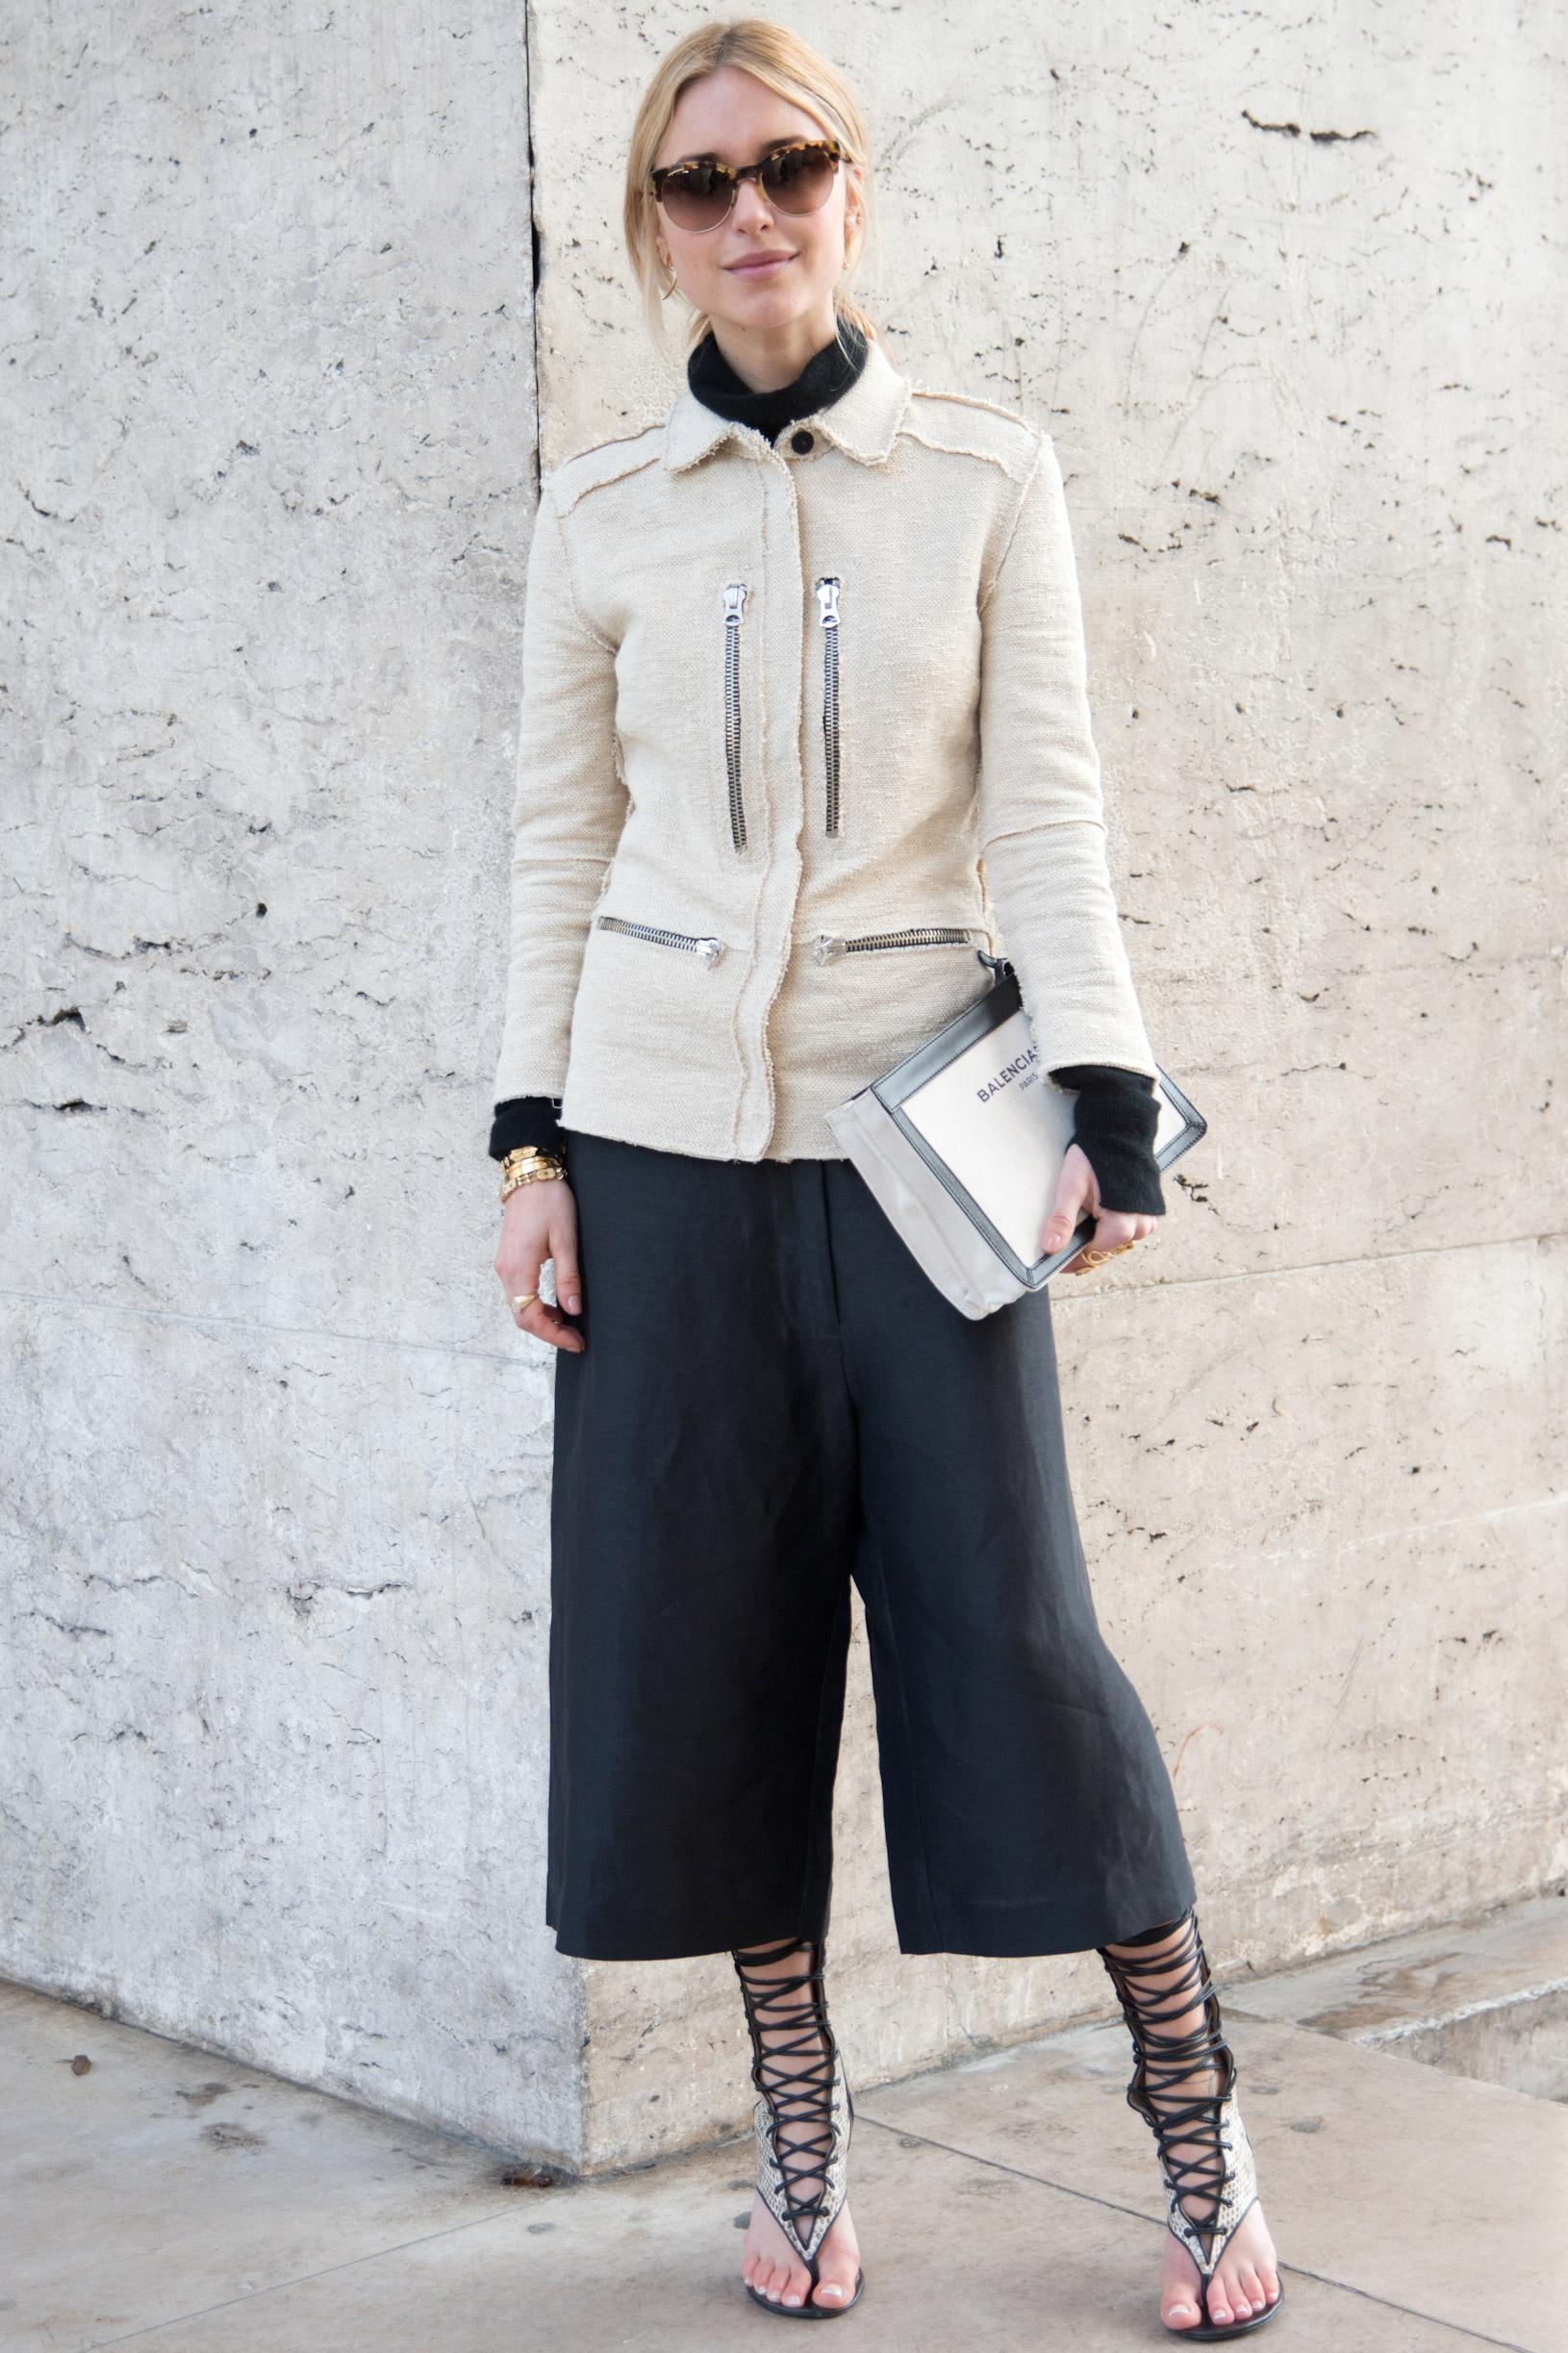 How To Emulate Pernille Teisbaek S Effortless Danish Style